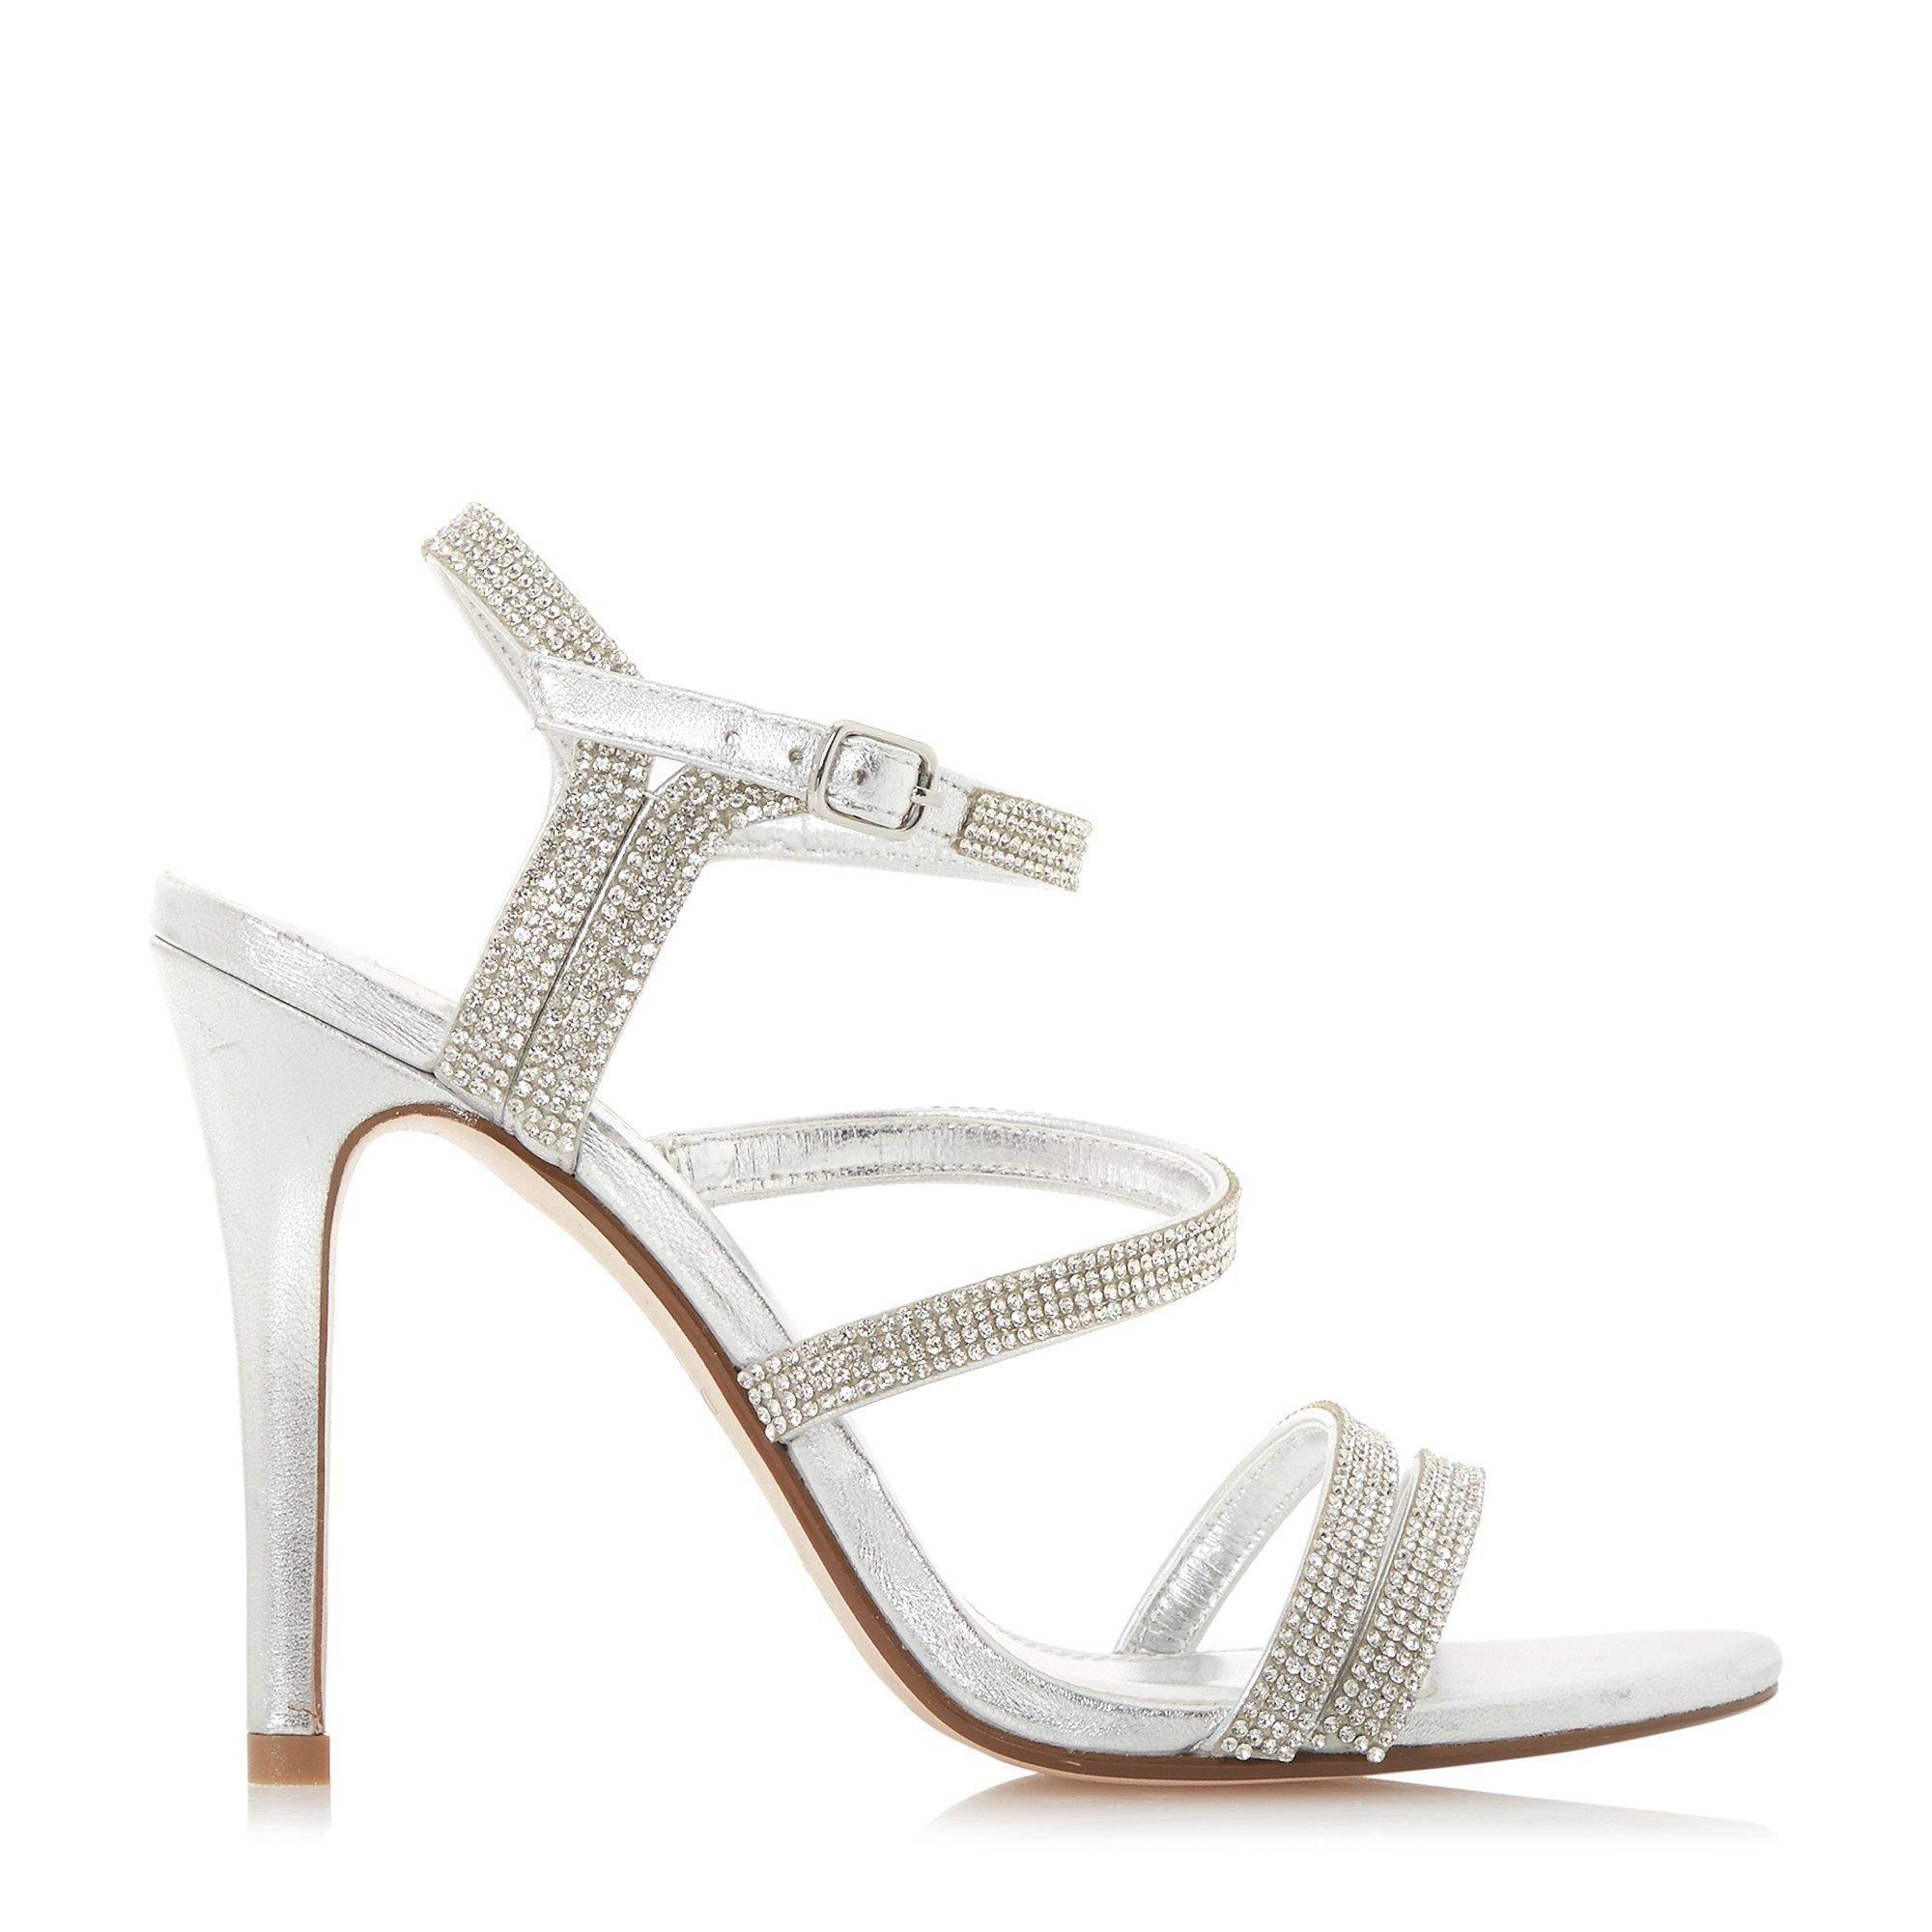 Dune Ladies MADONA Embellished Strappy High Heel Sandals